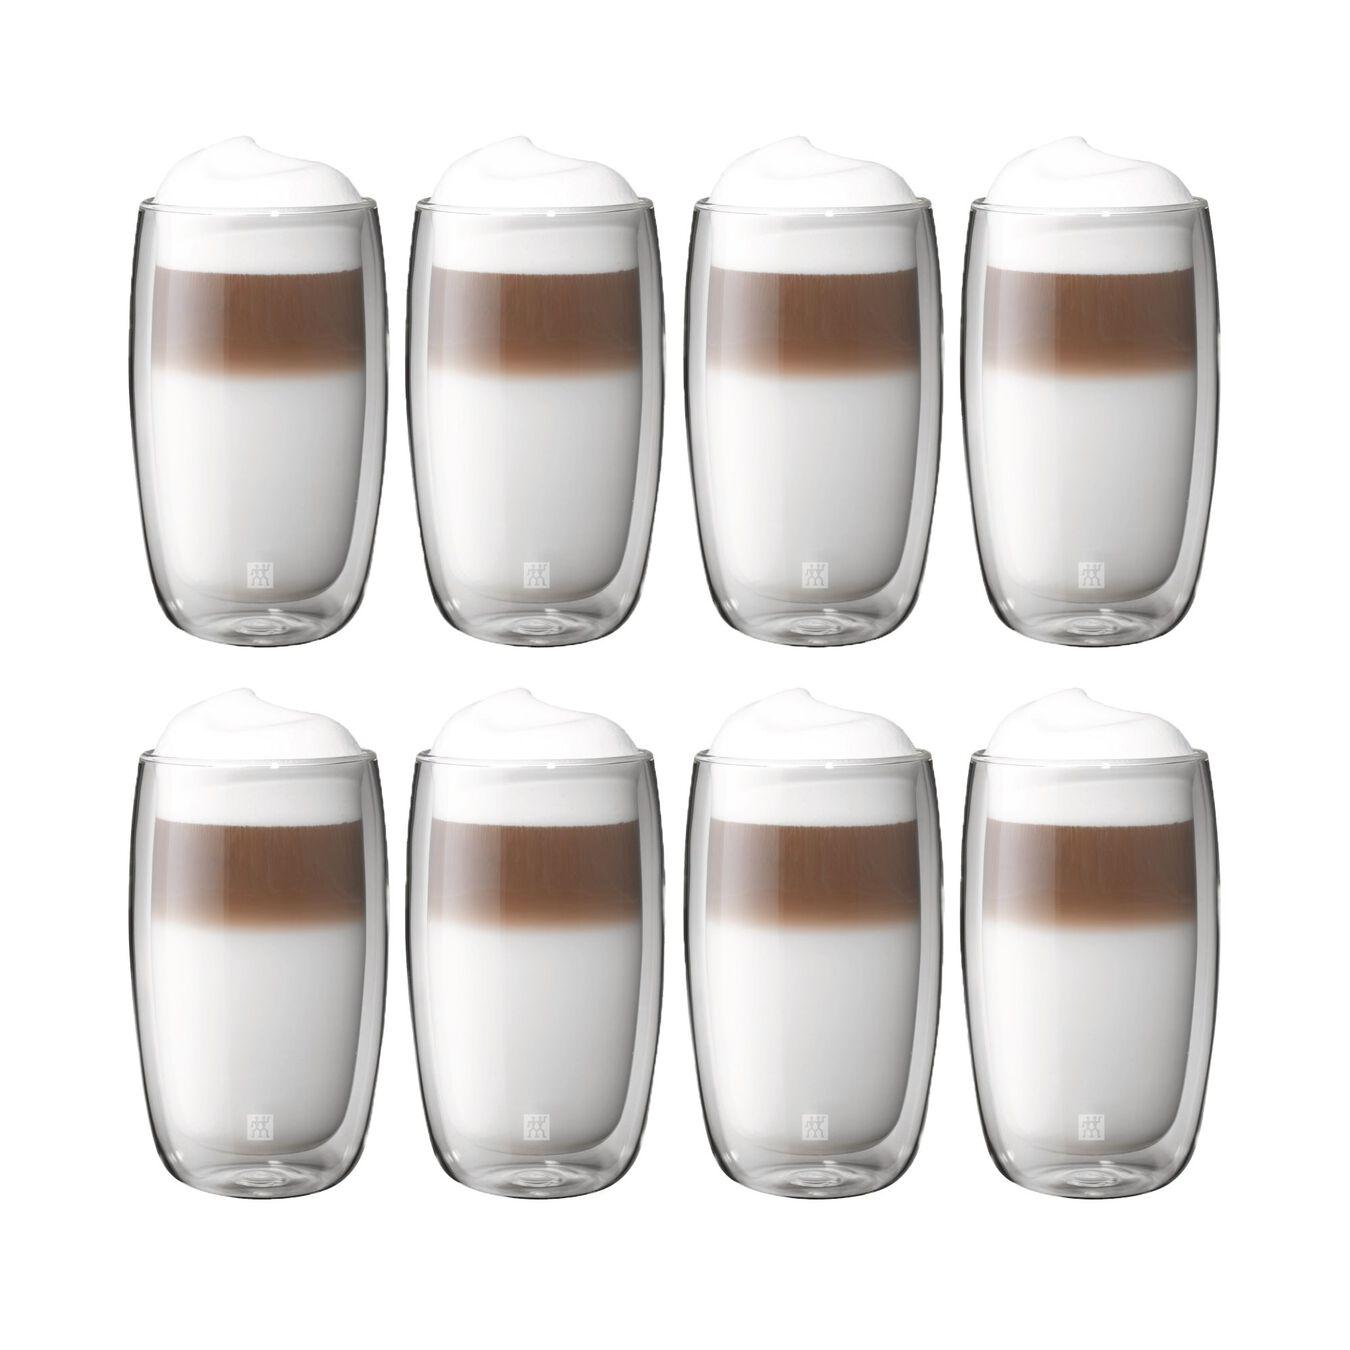 8 Piece Latte Glass Set - Value Pack,,large 1